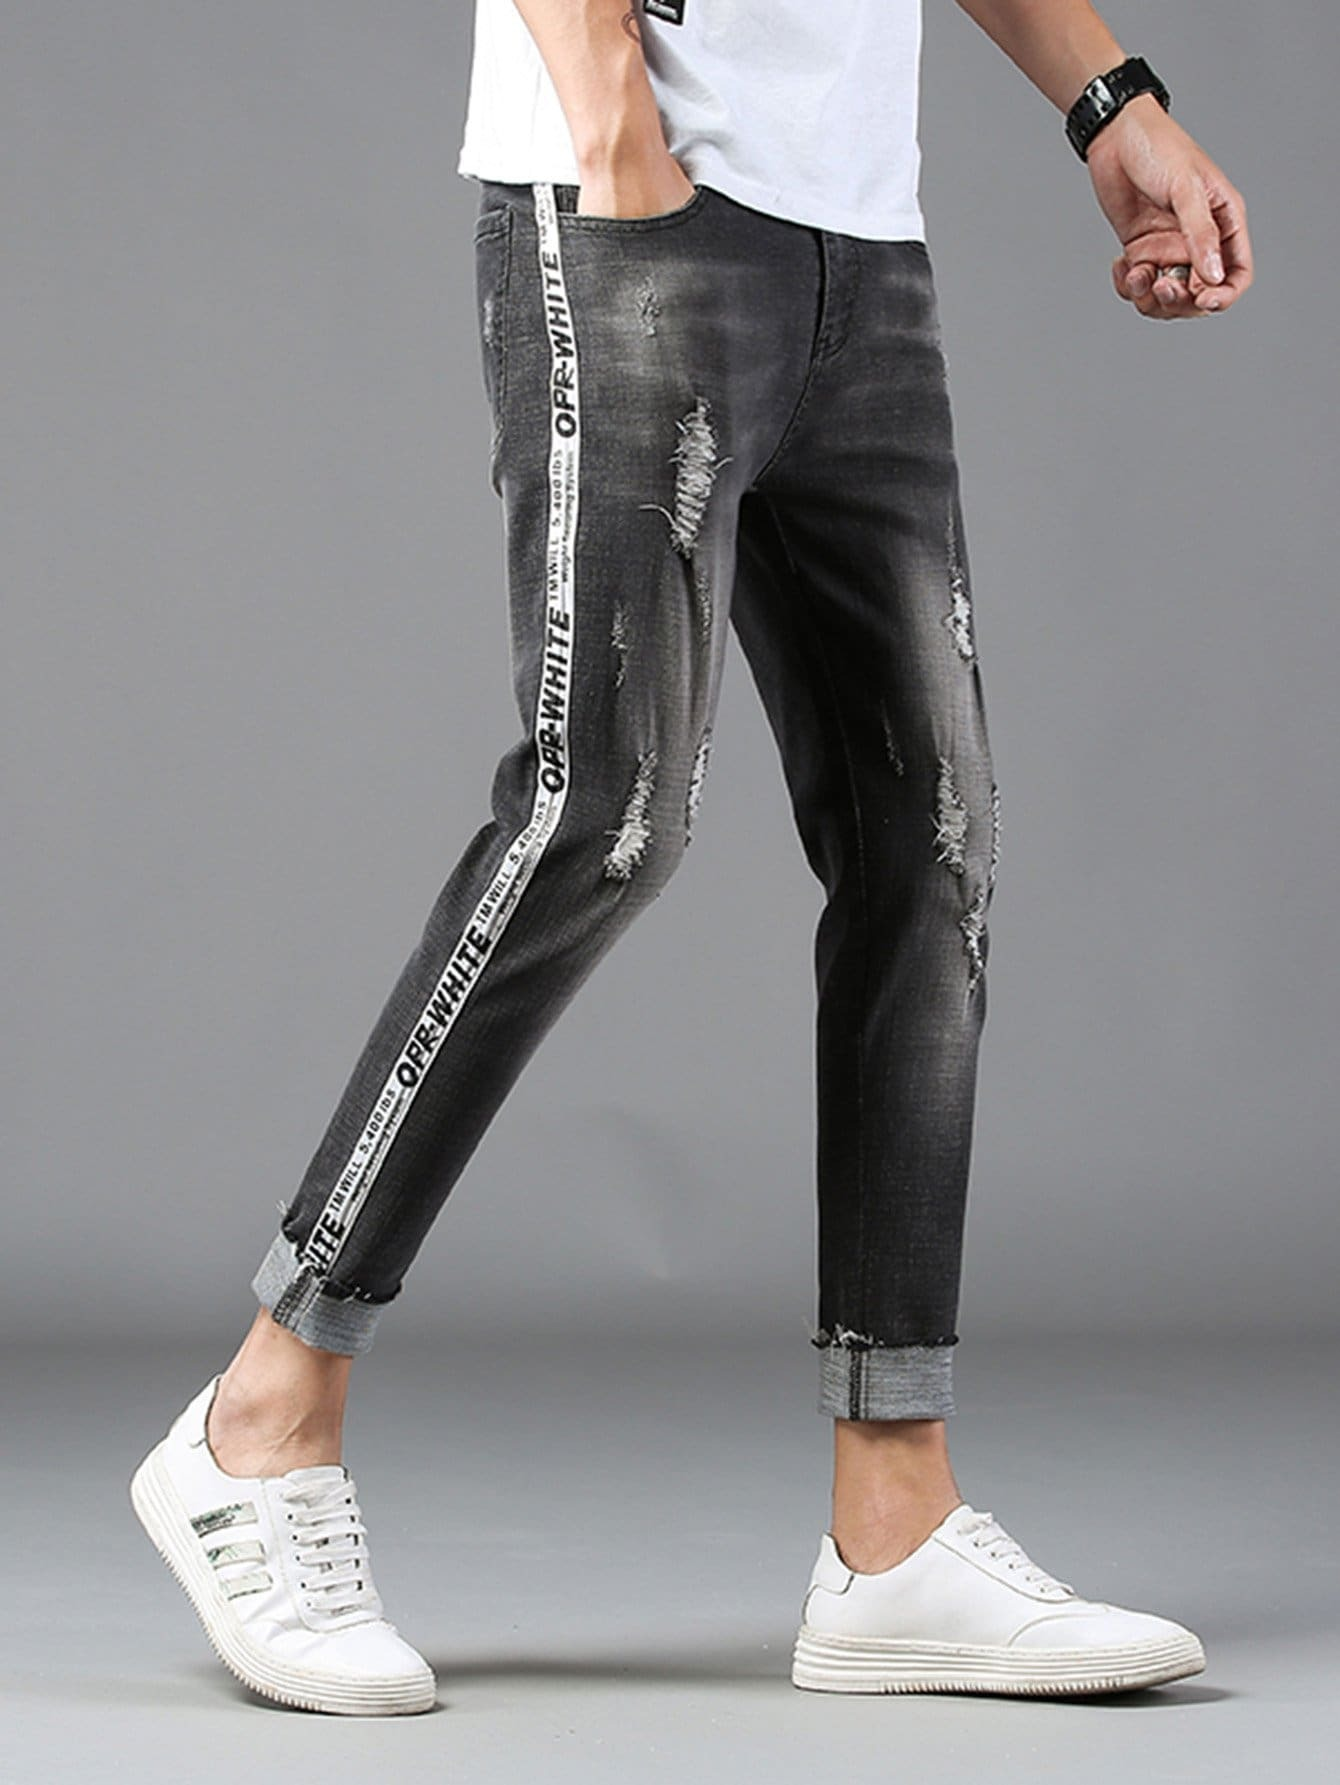 m nner zerrissene schmale jeans german shein sheinside. Black Bedroom Furniture Sets. Home Design Ideas